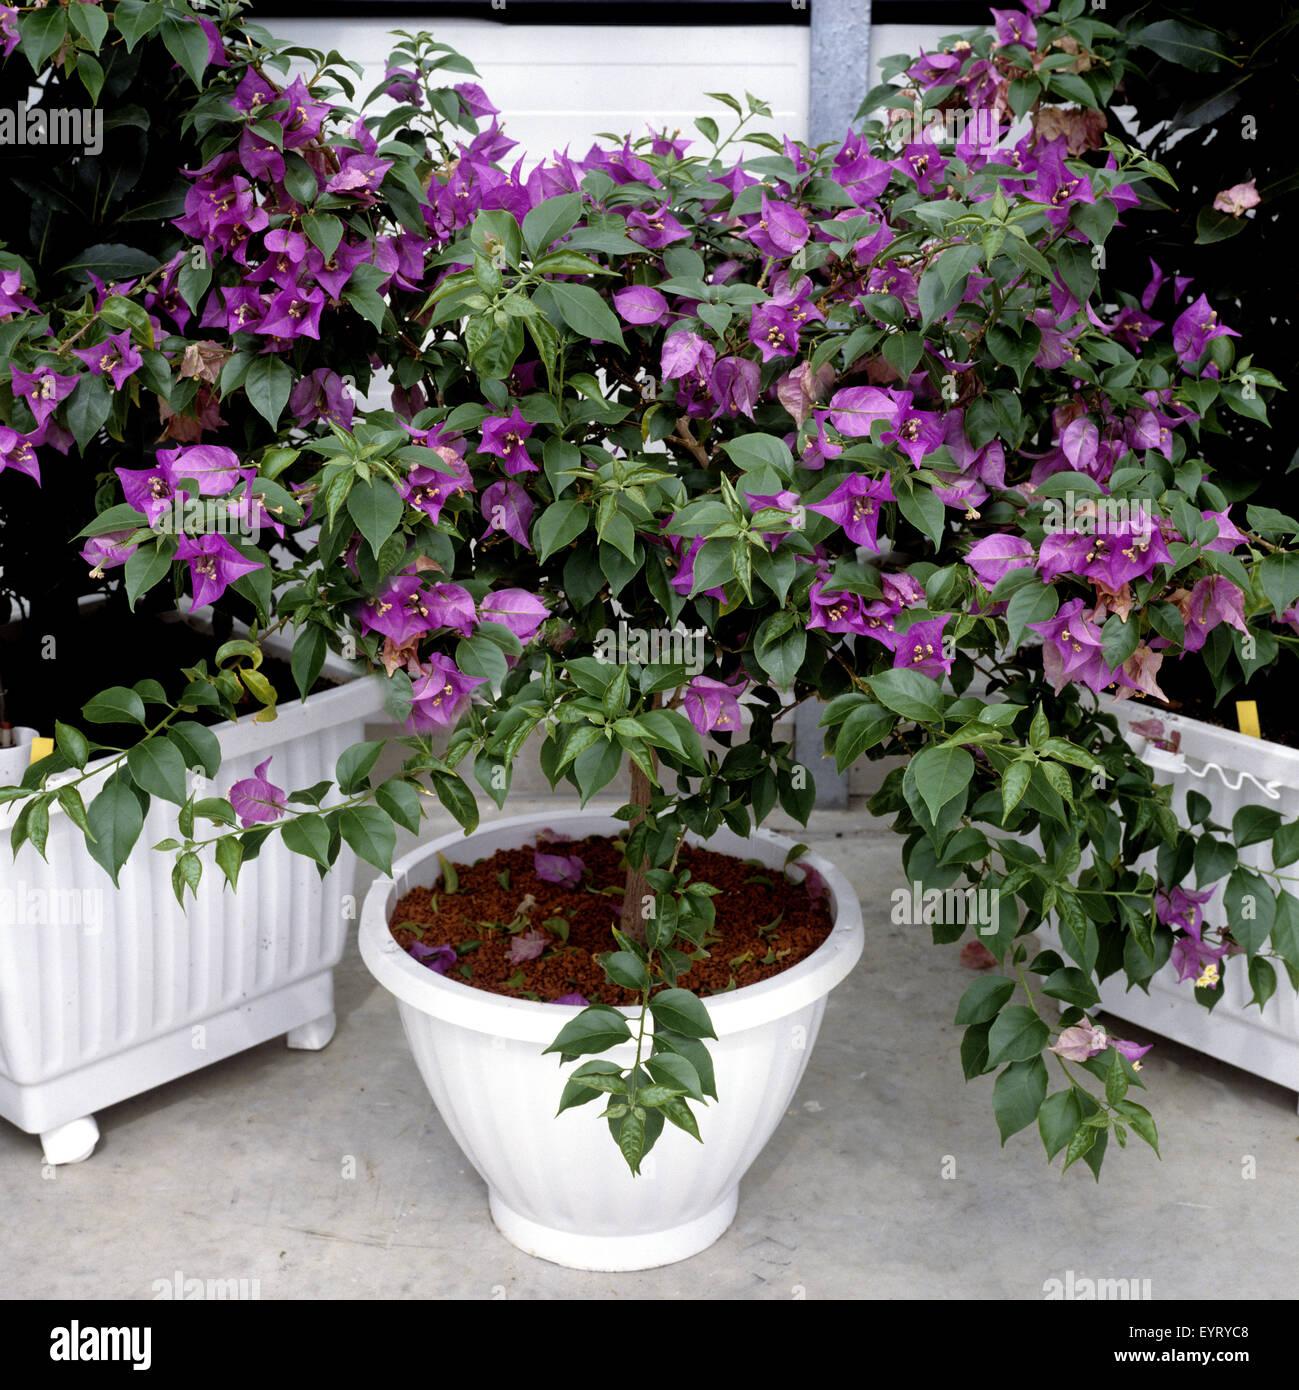 Bougainvillea glabra, Papierblume, Wunderblume Stock Photo